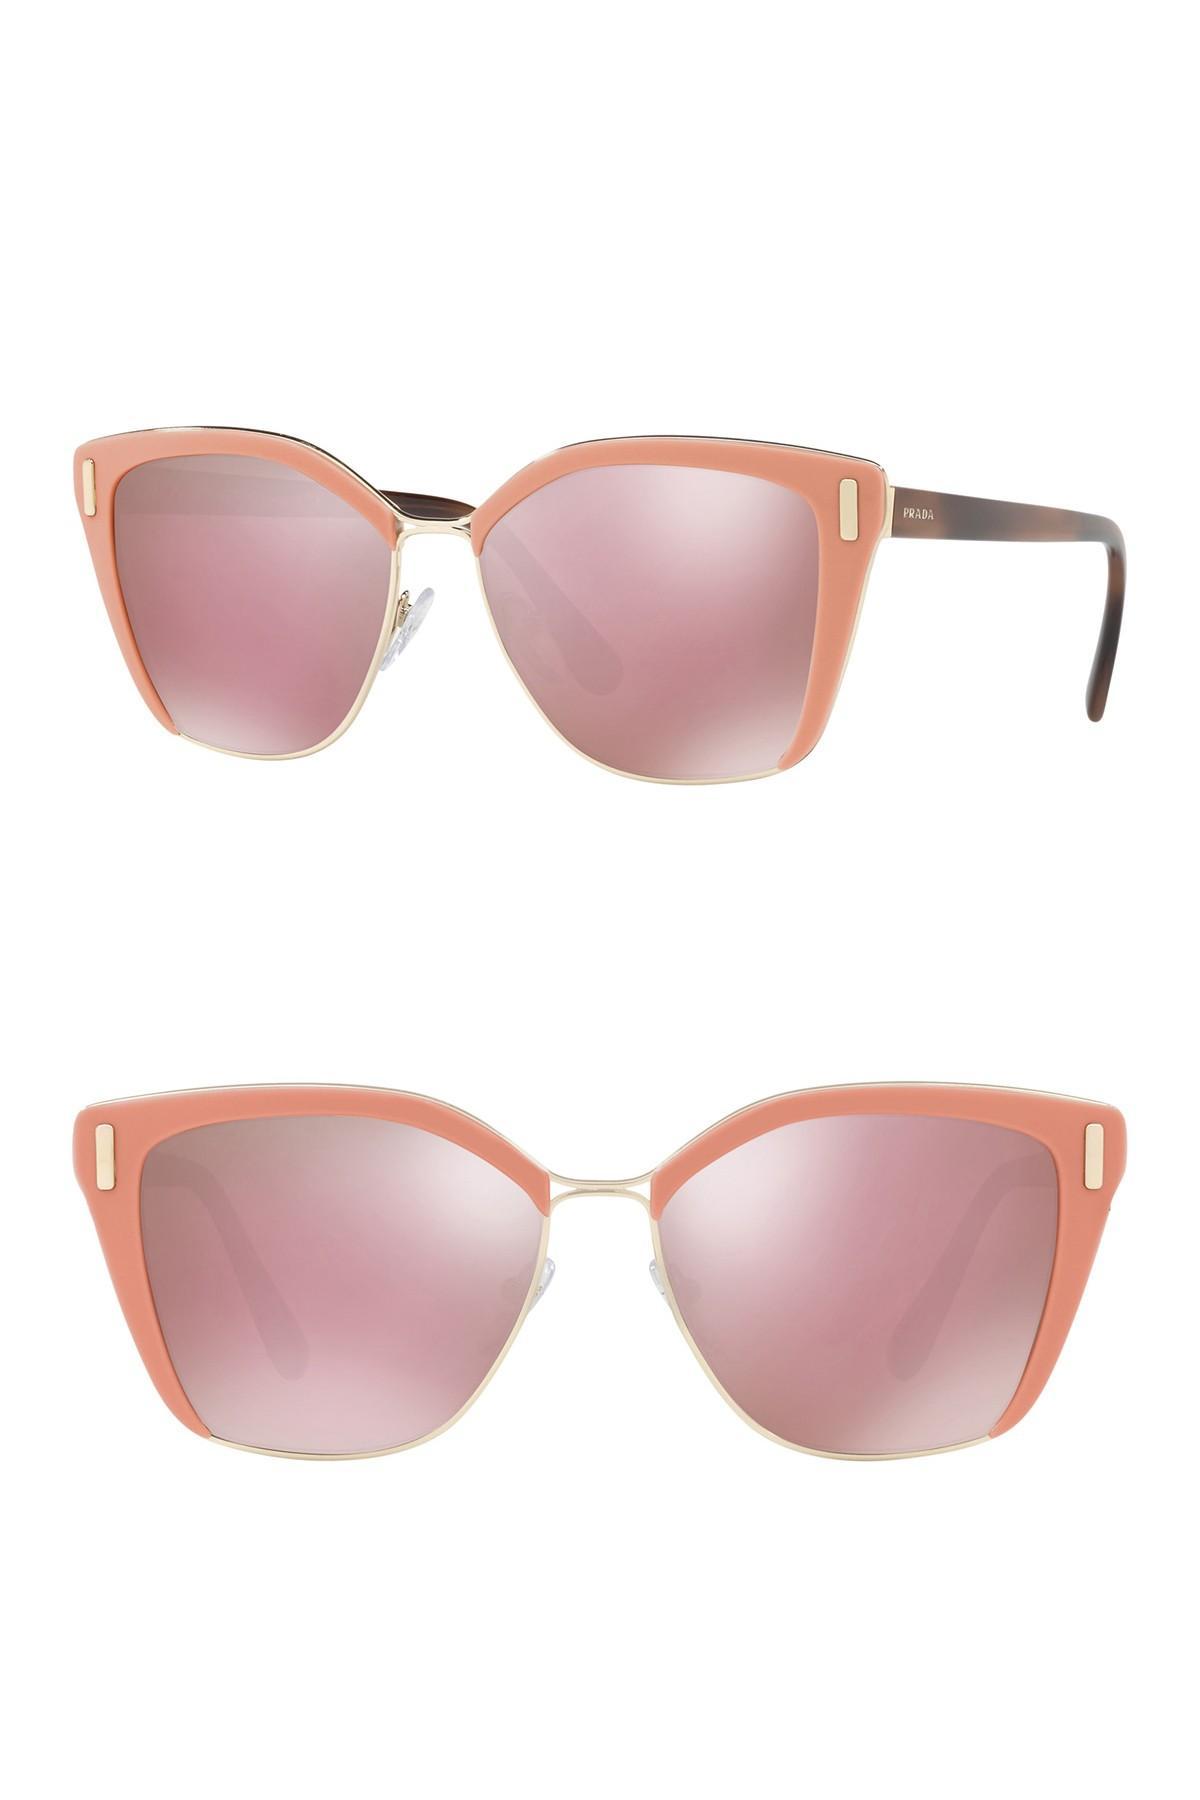 c4a58a89506 Prada - Pink 57mm Square Sunglasses - Lyst. View fullscreen